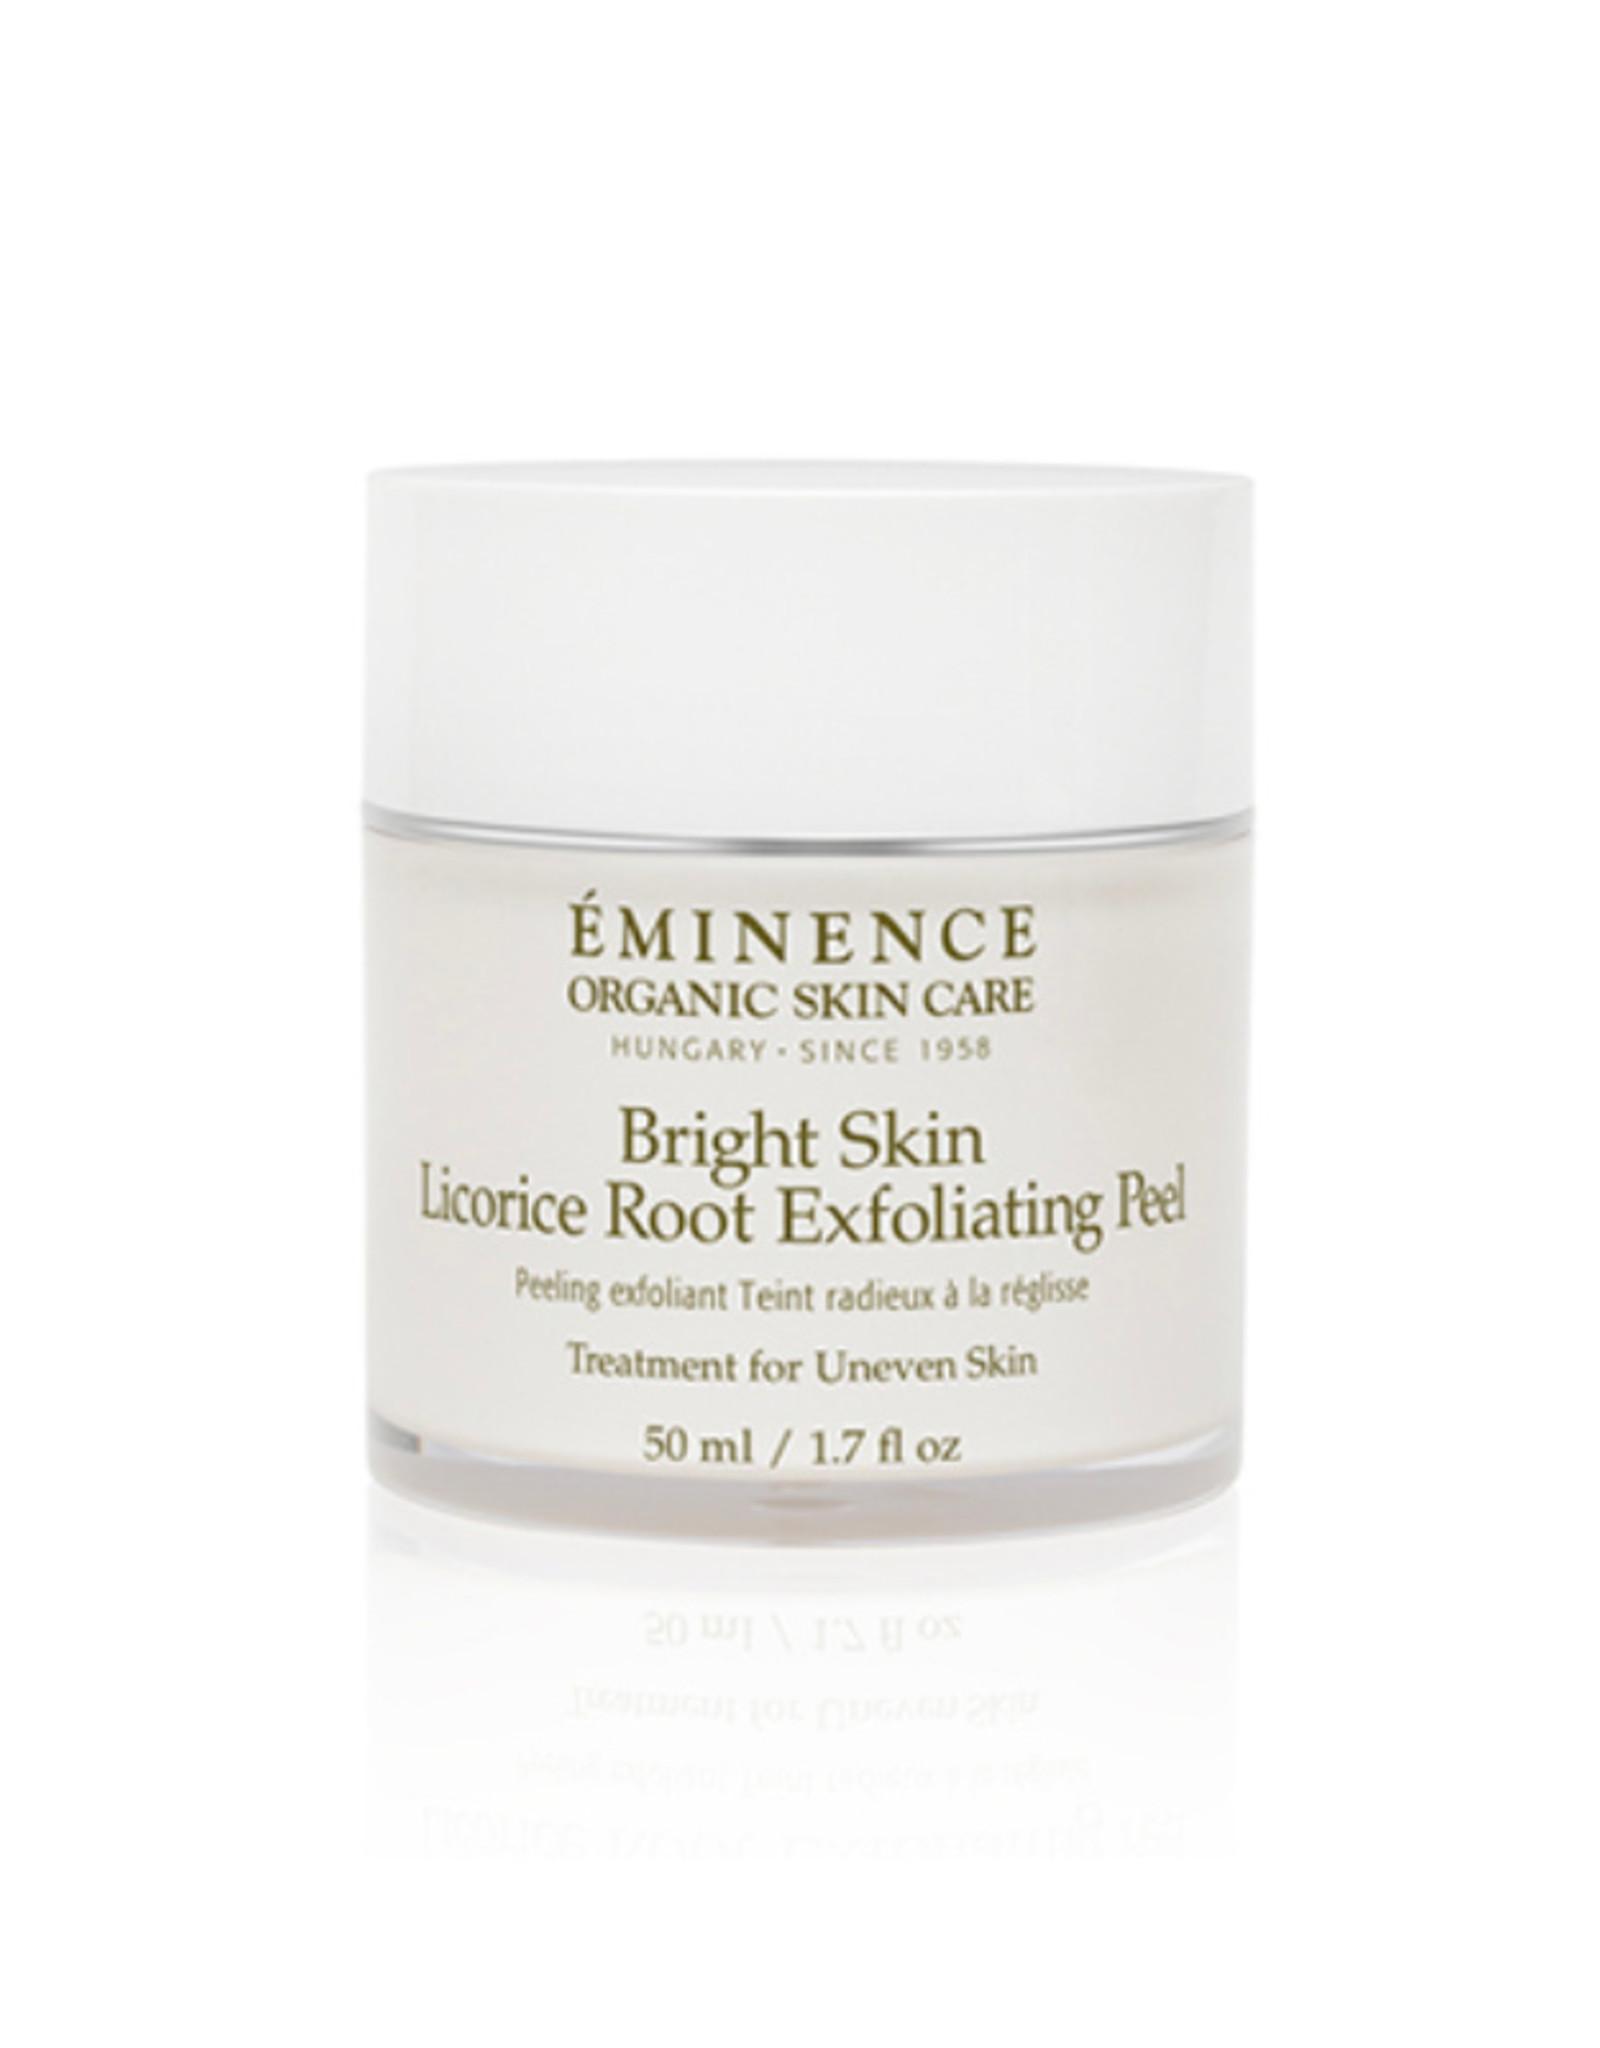 Eminence Bright Skin Licorice Root Exfoliating Peel